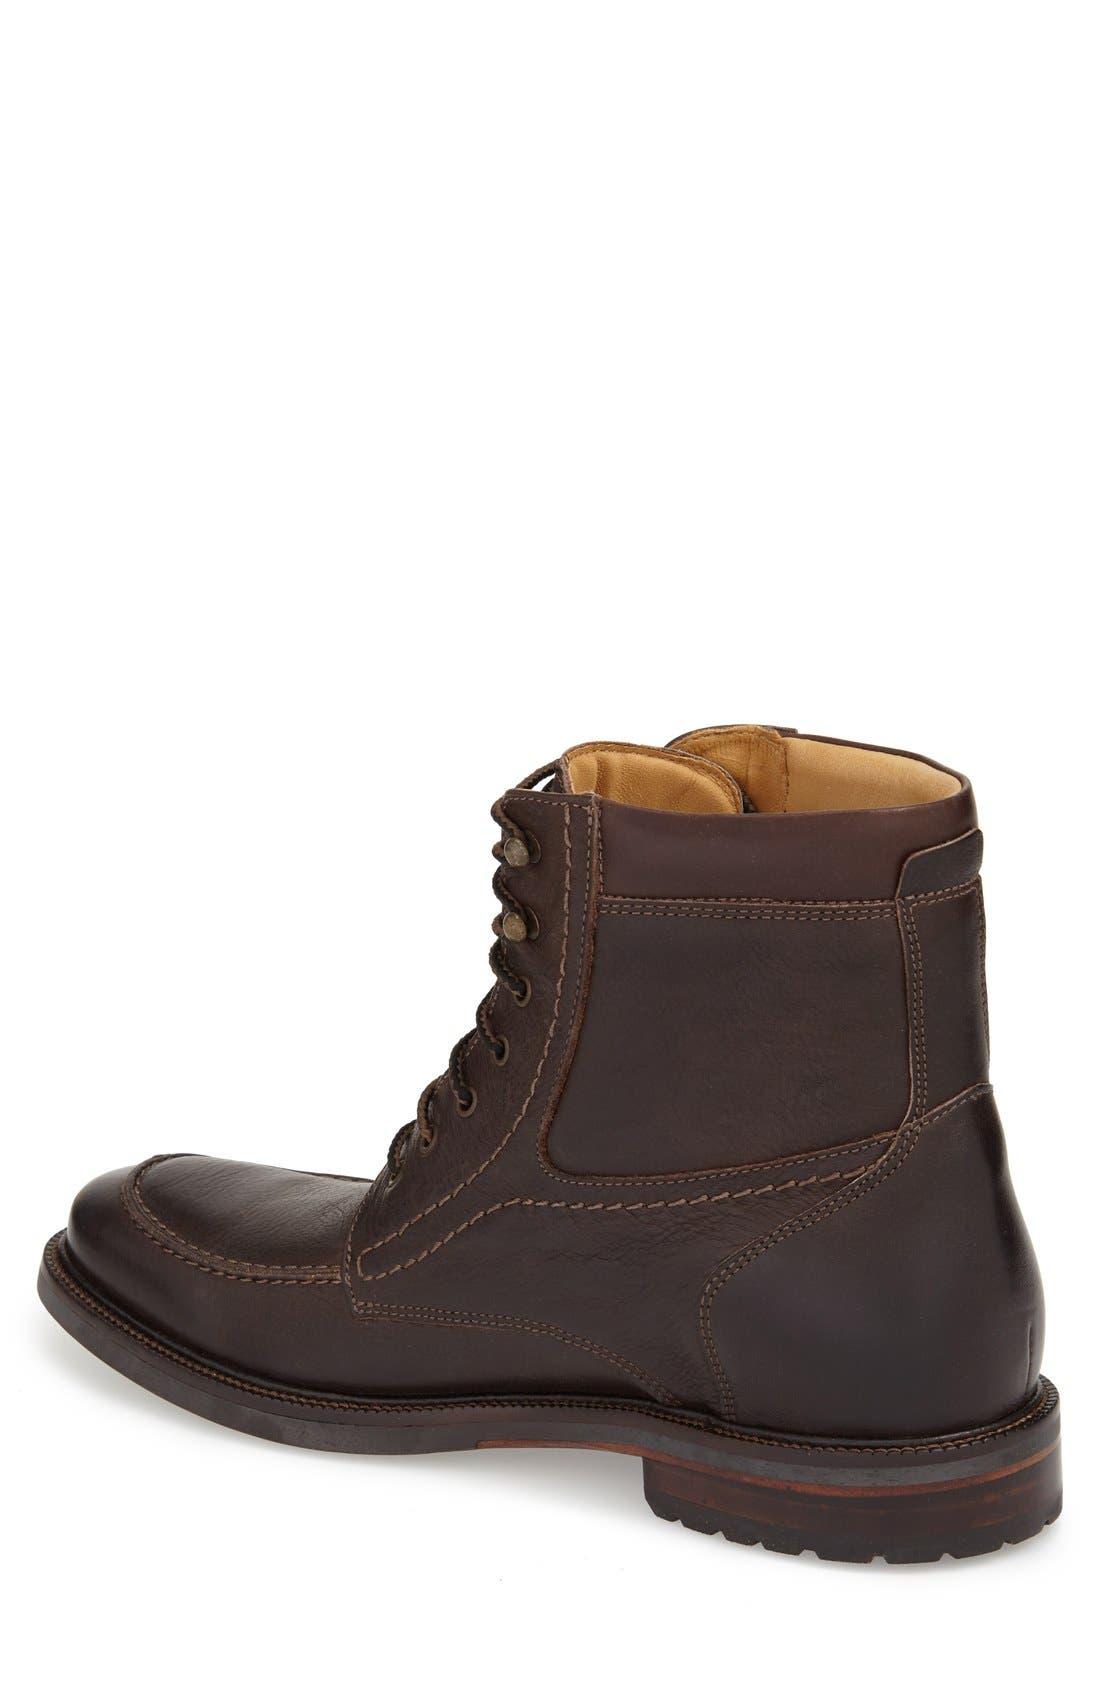 'Baird' Moc Toe Boot,                             Alternate thumbnail 2, color,                             201